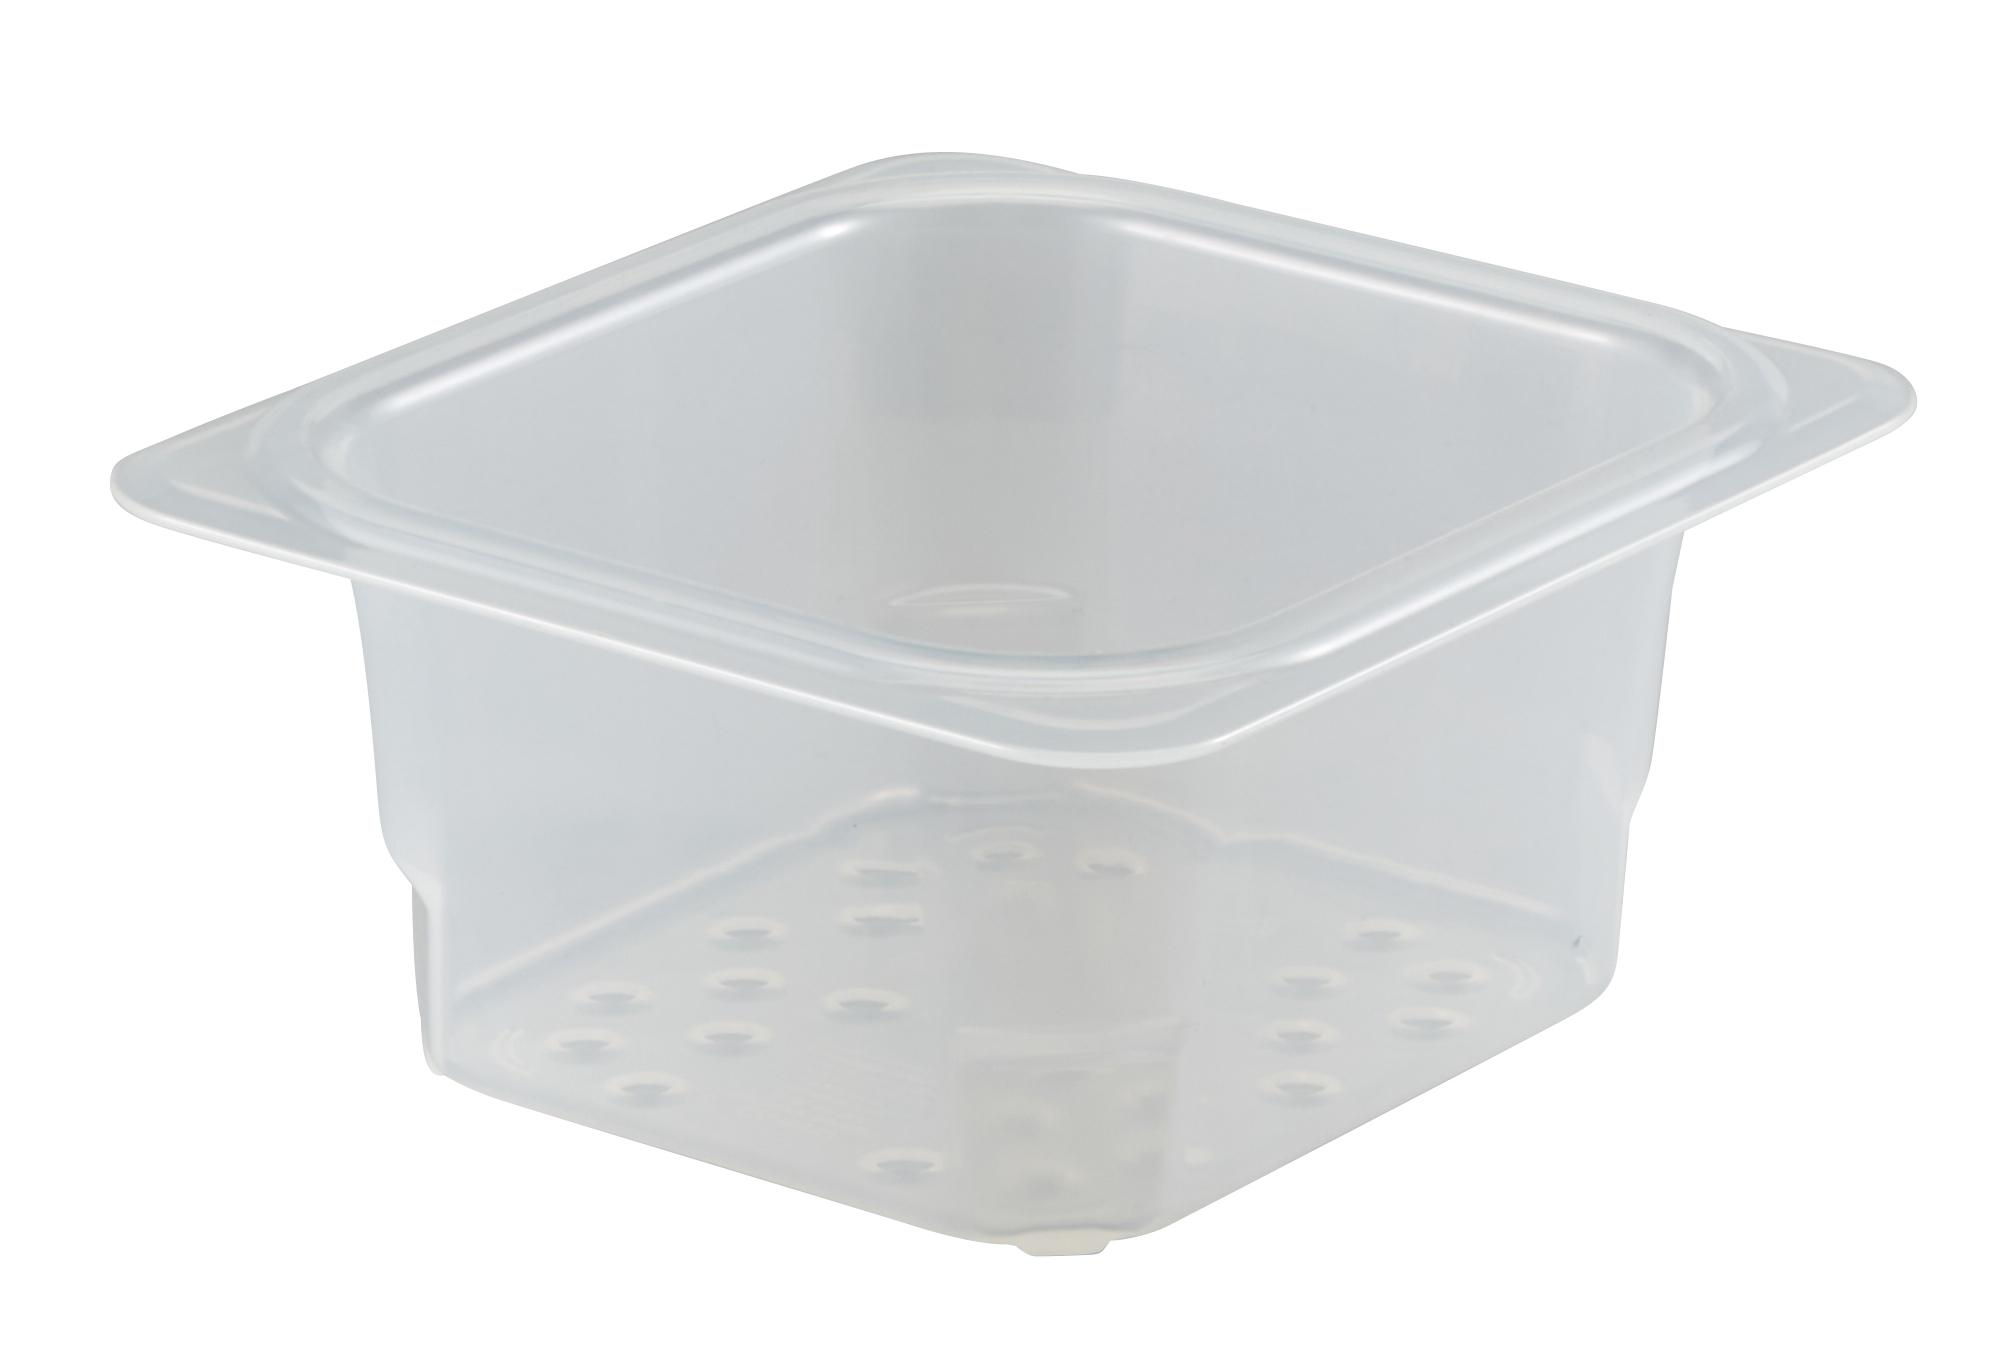 Cambro 63CLRPP190 food/beverage storage container